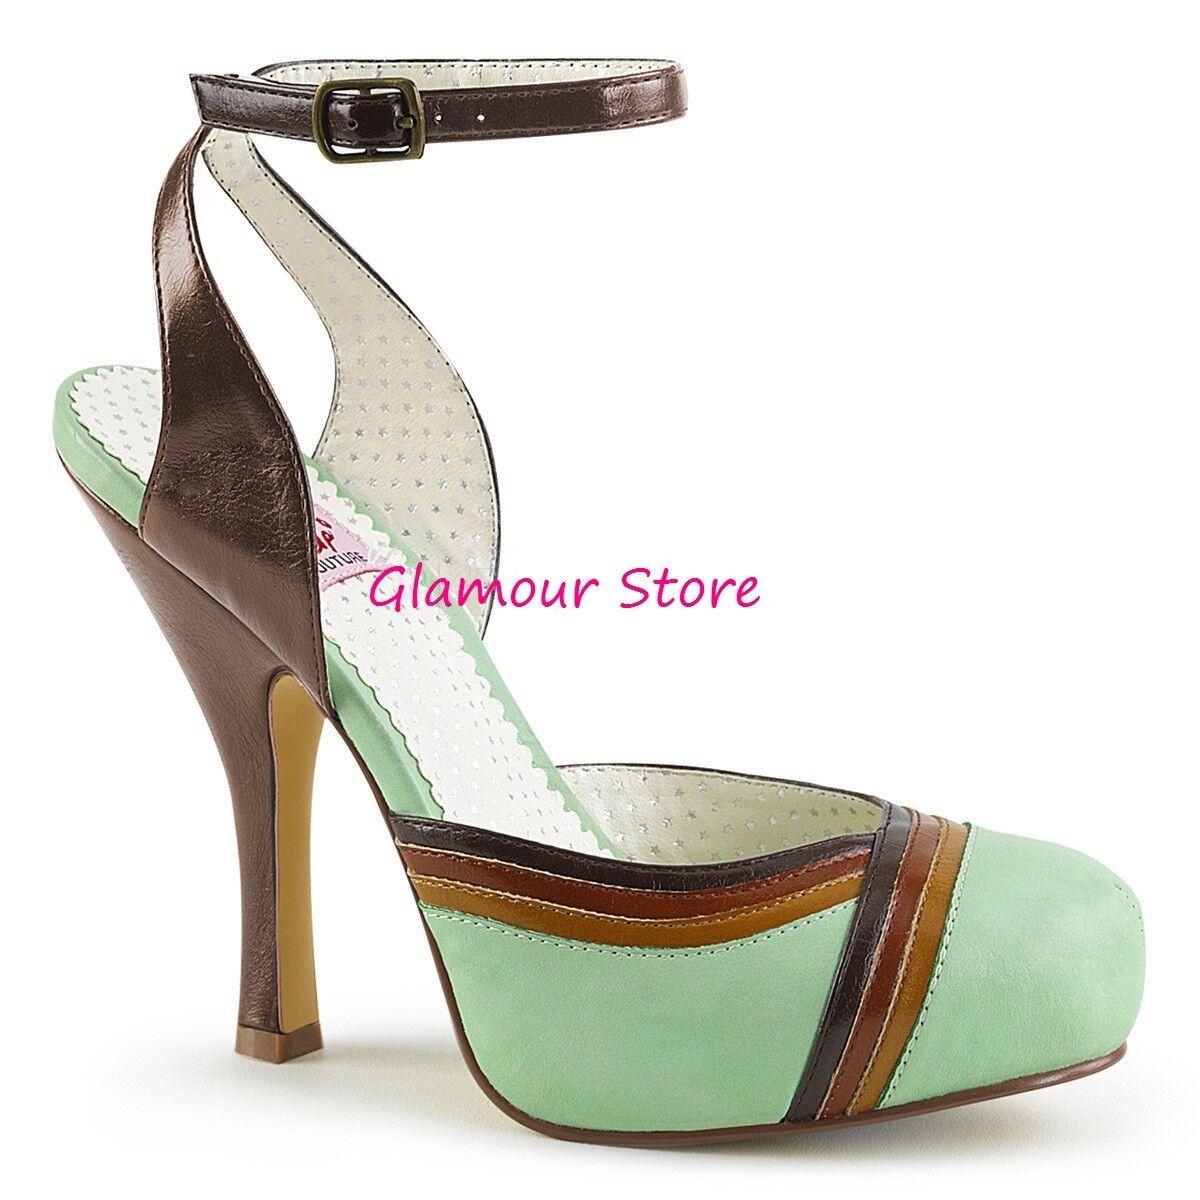 Sexy chaussures PIN UP tacco 11,5 dal 35 al 41 vert MULTICouleurE plateau sandali